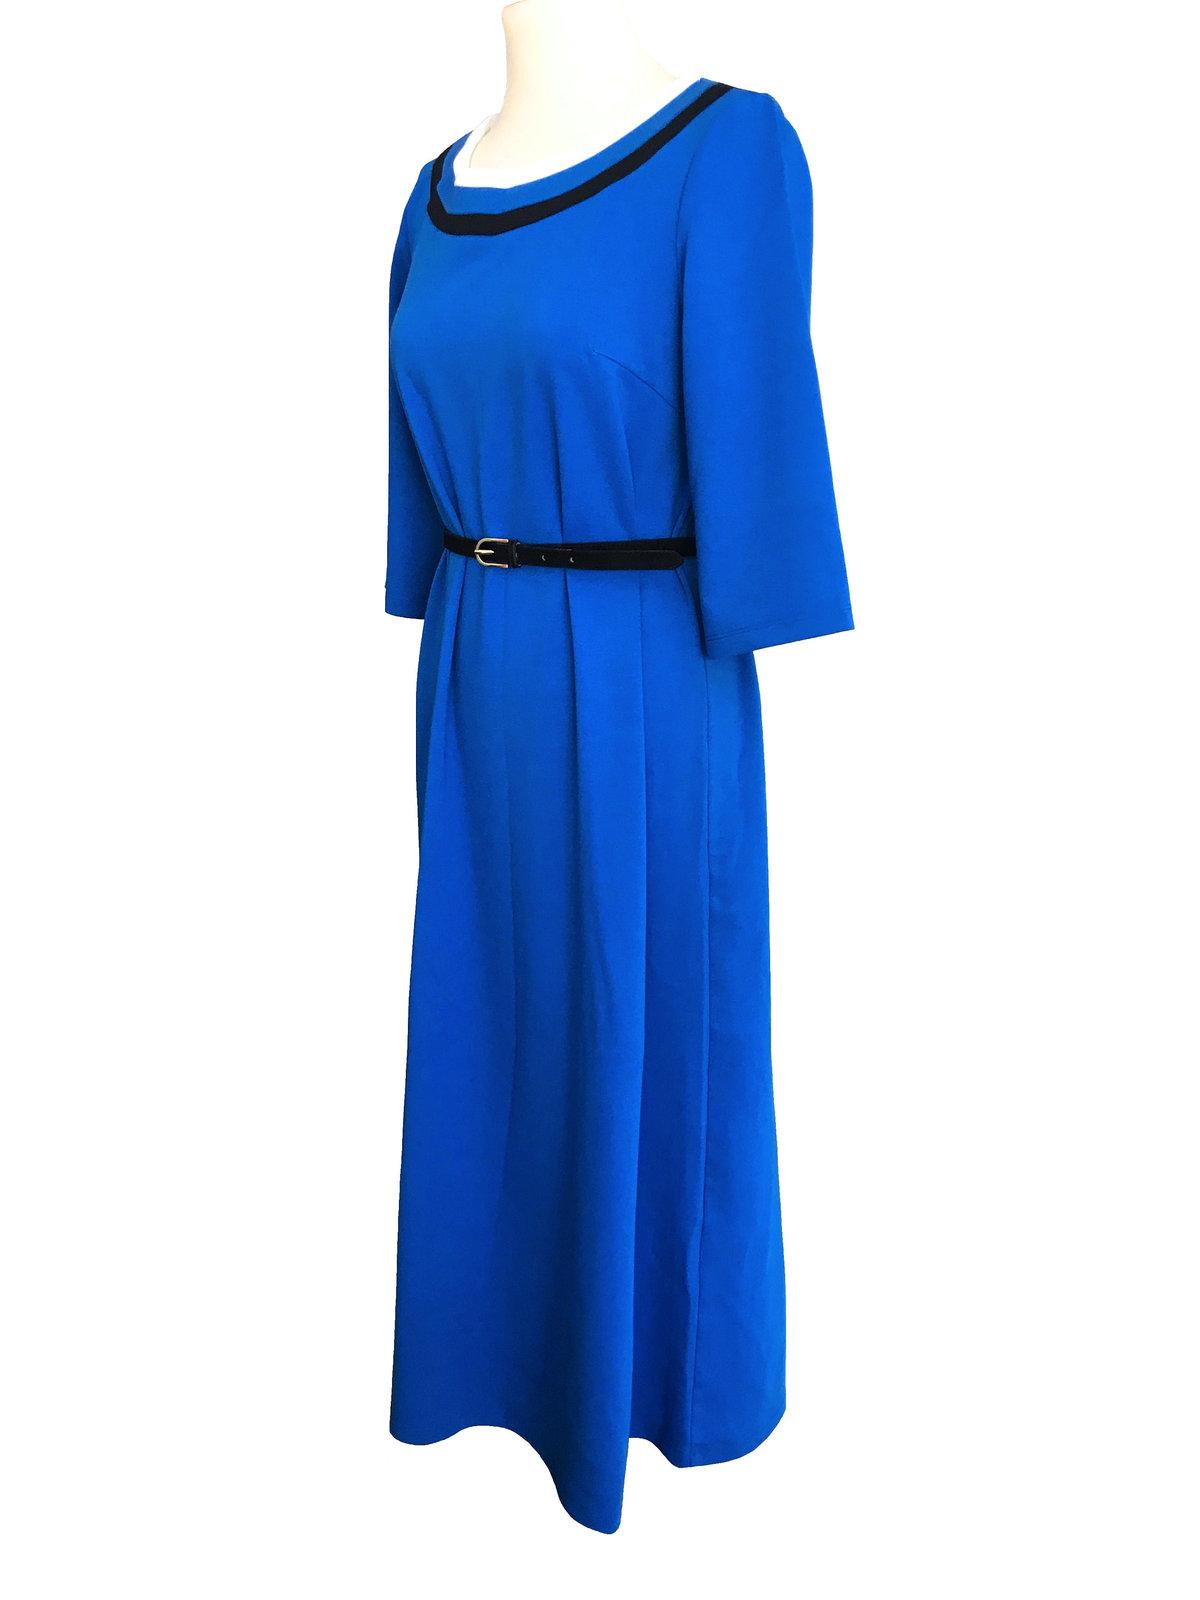 80s Retro Styled Cobalt Blue Nautical Cotton Knit Flare 3/4 Sleeve Trapeze Dress